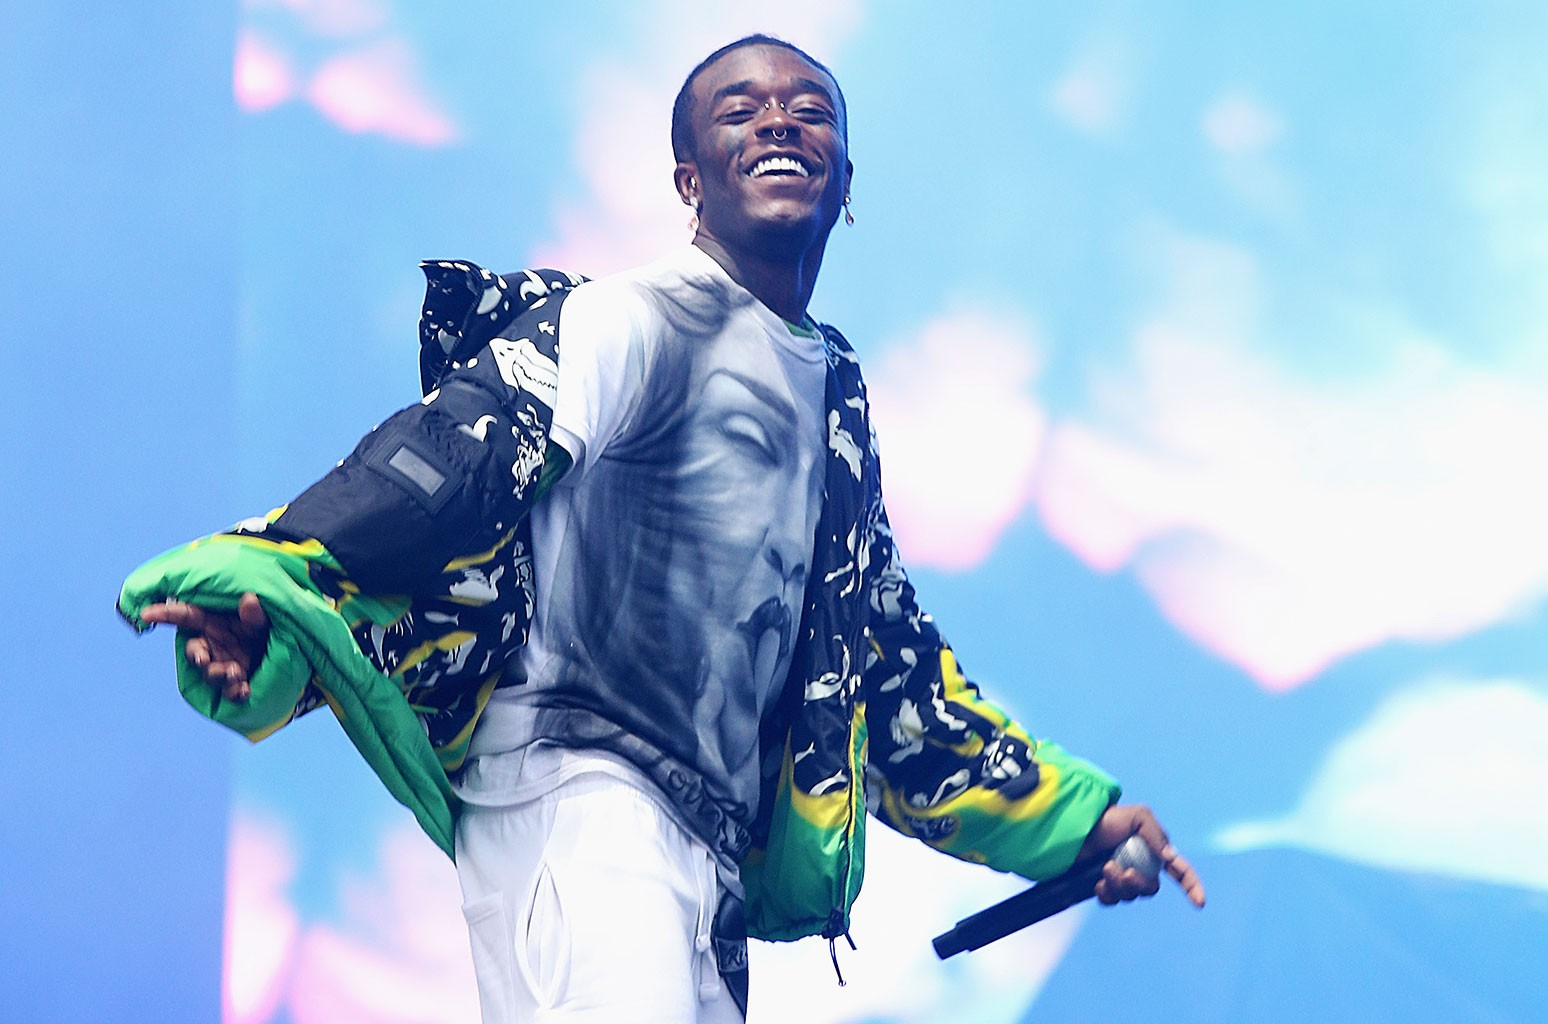 Lil Uzi Vert S 15 Best Songs Critic S Picks Billboard